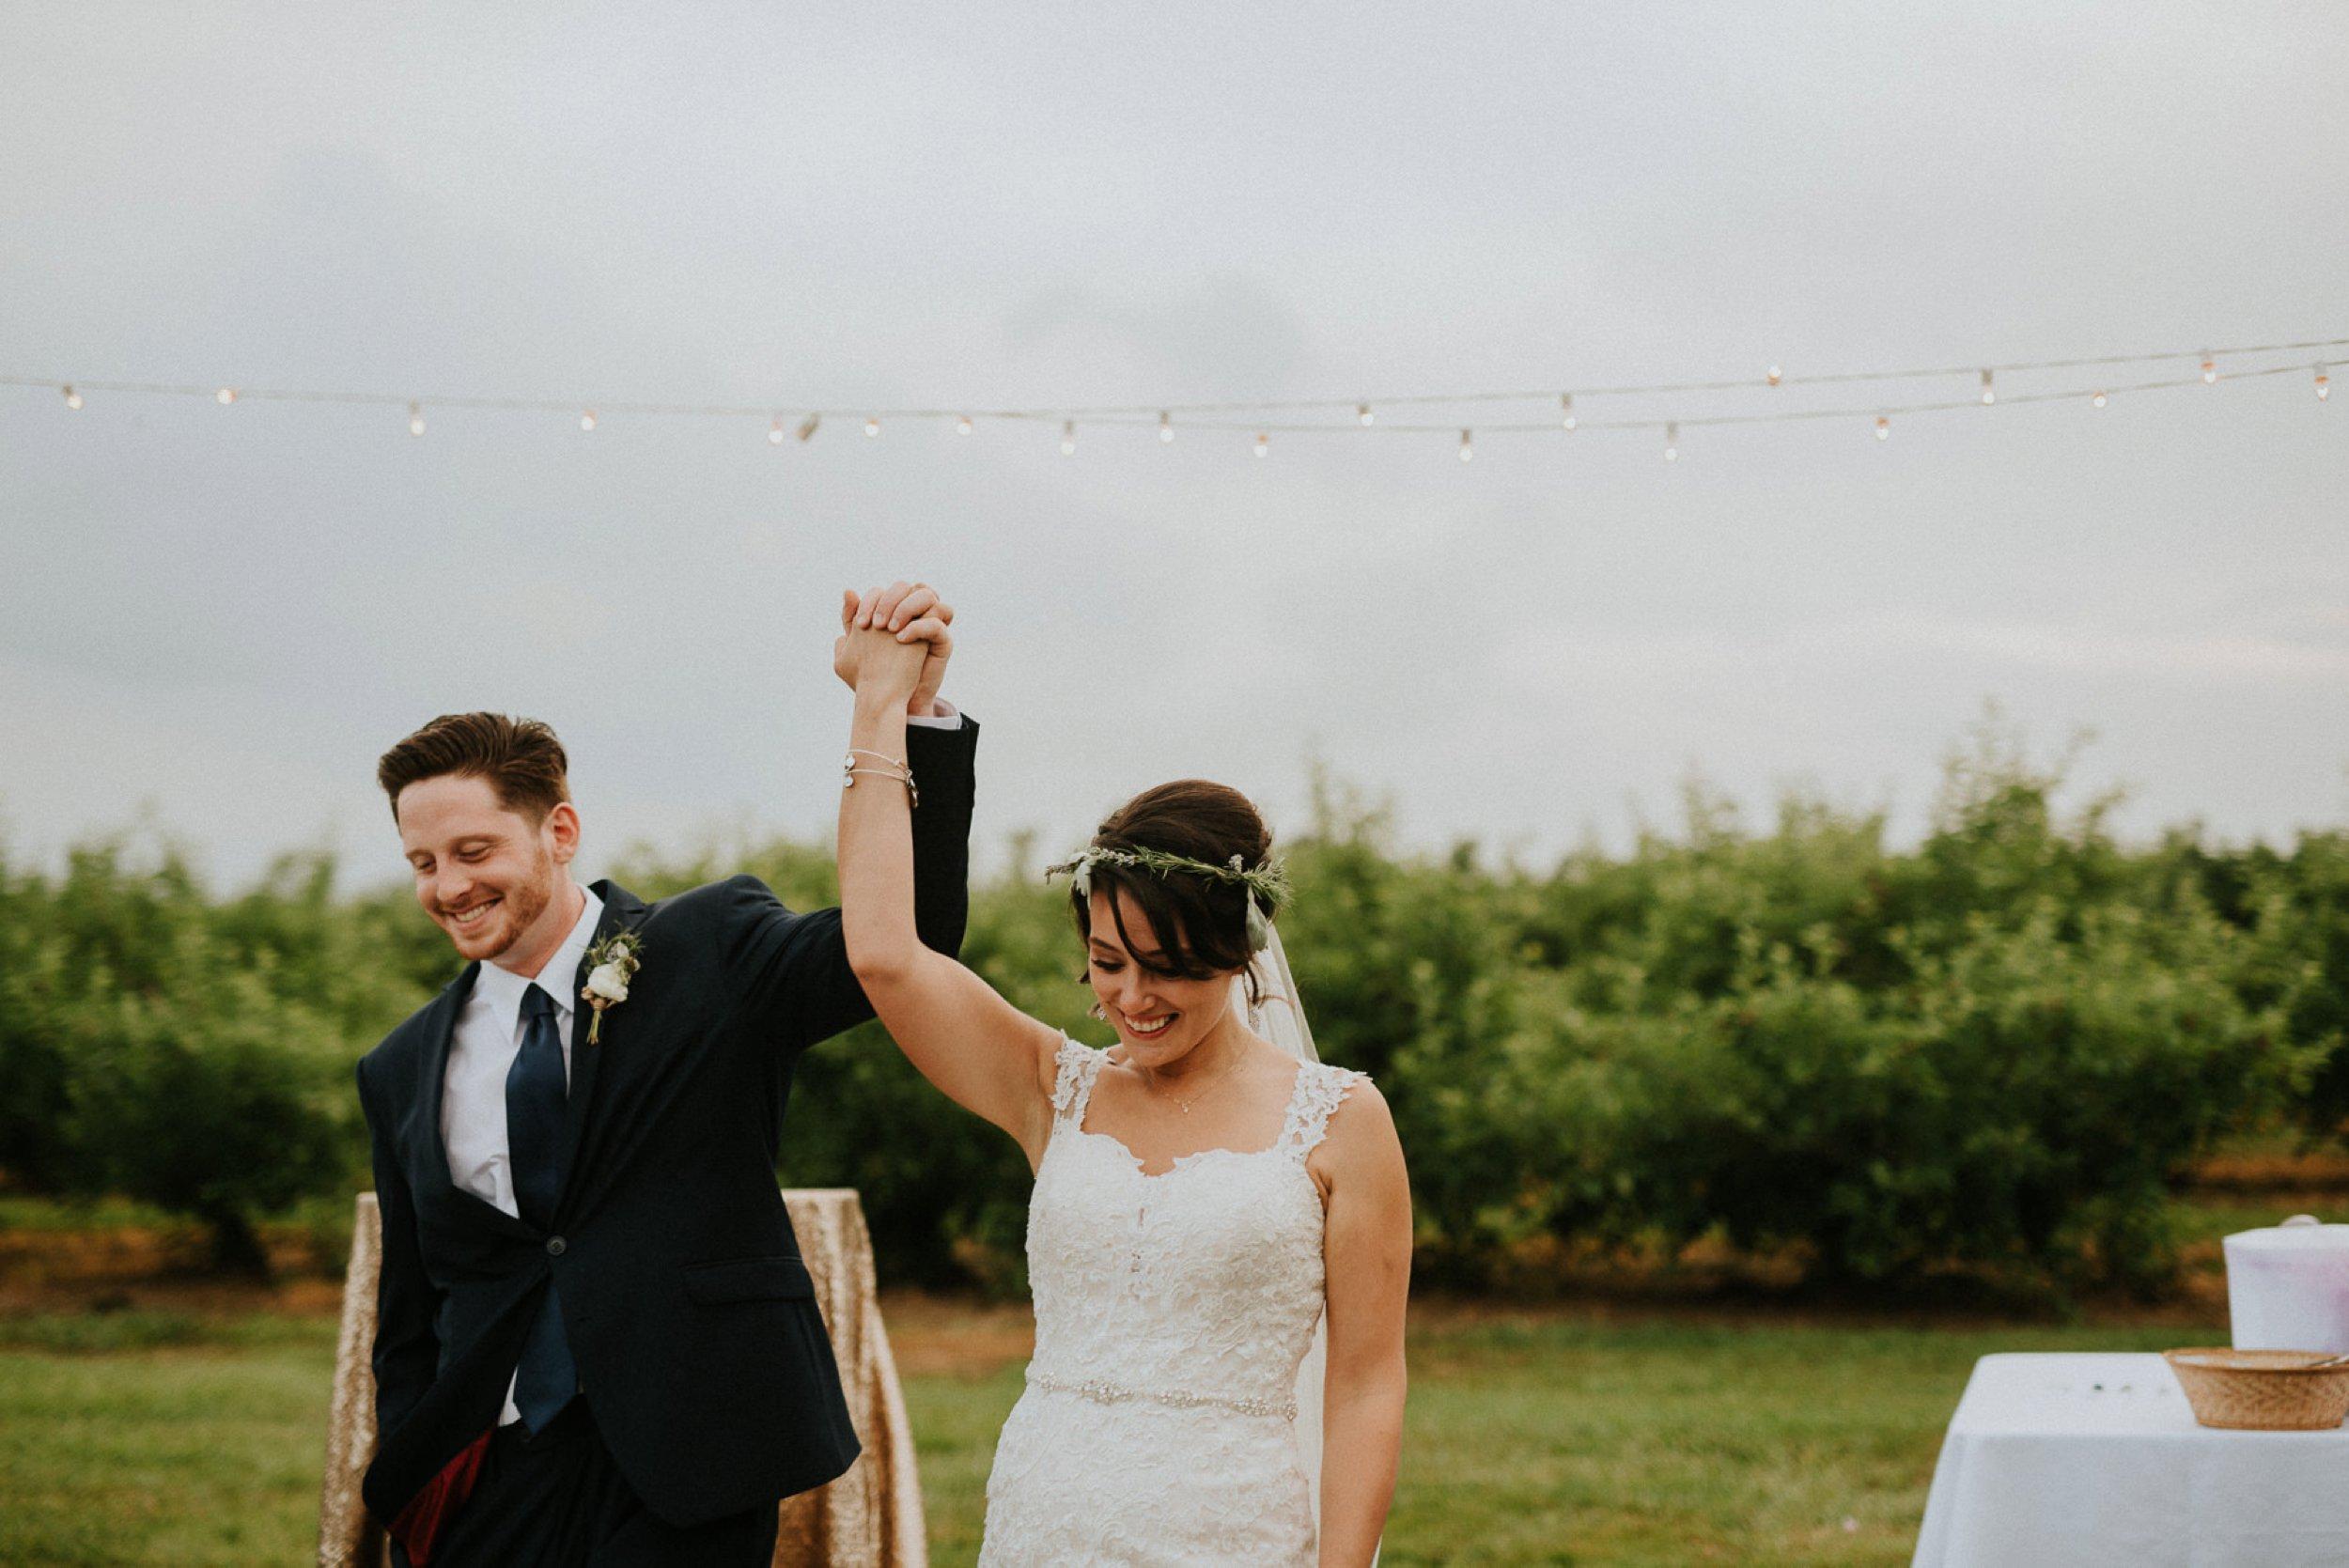 milburn_farms-wedding-91.jpg